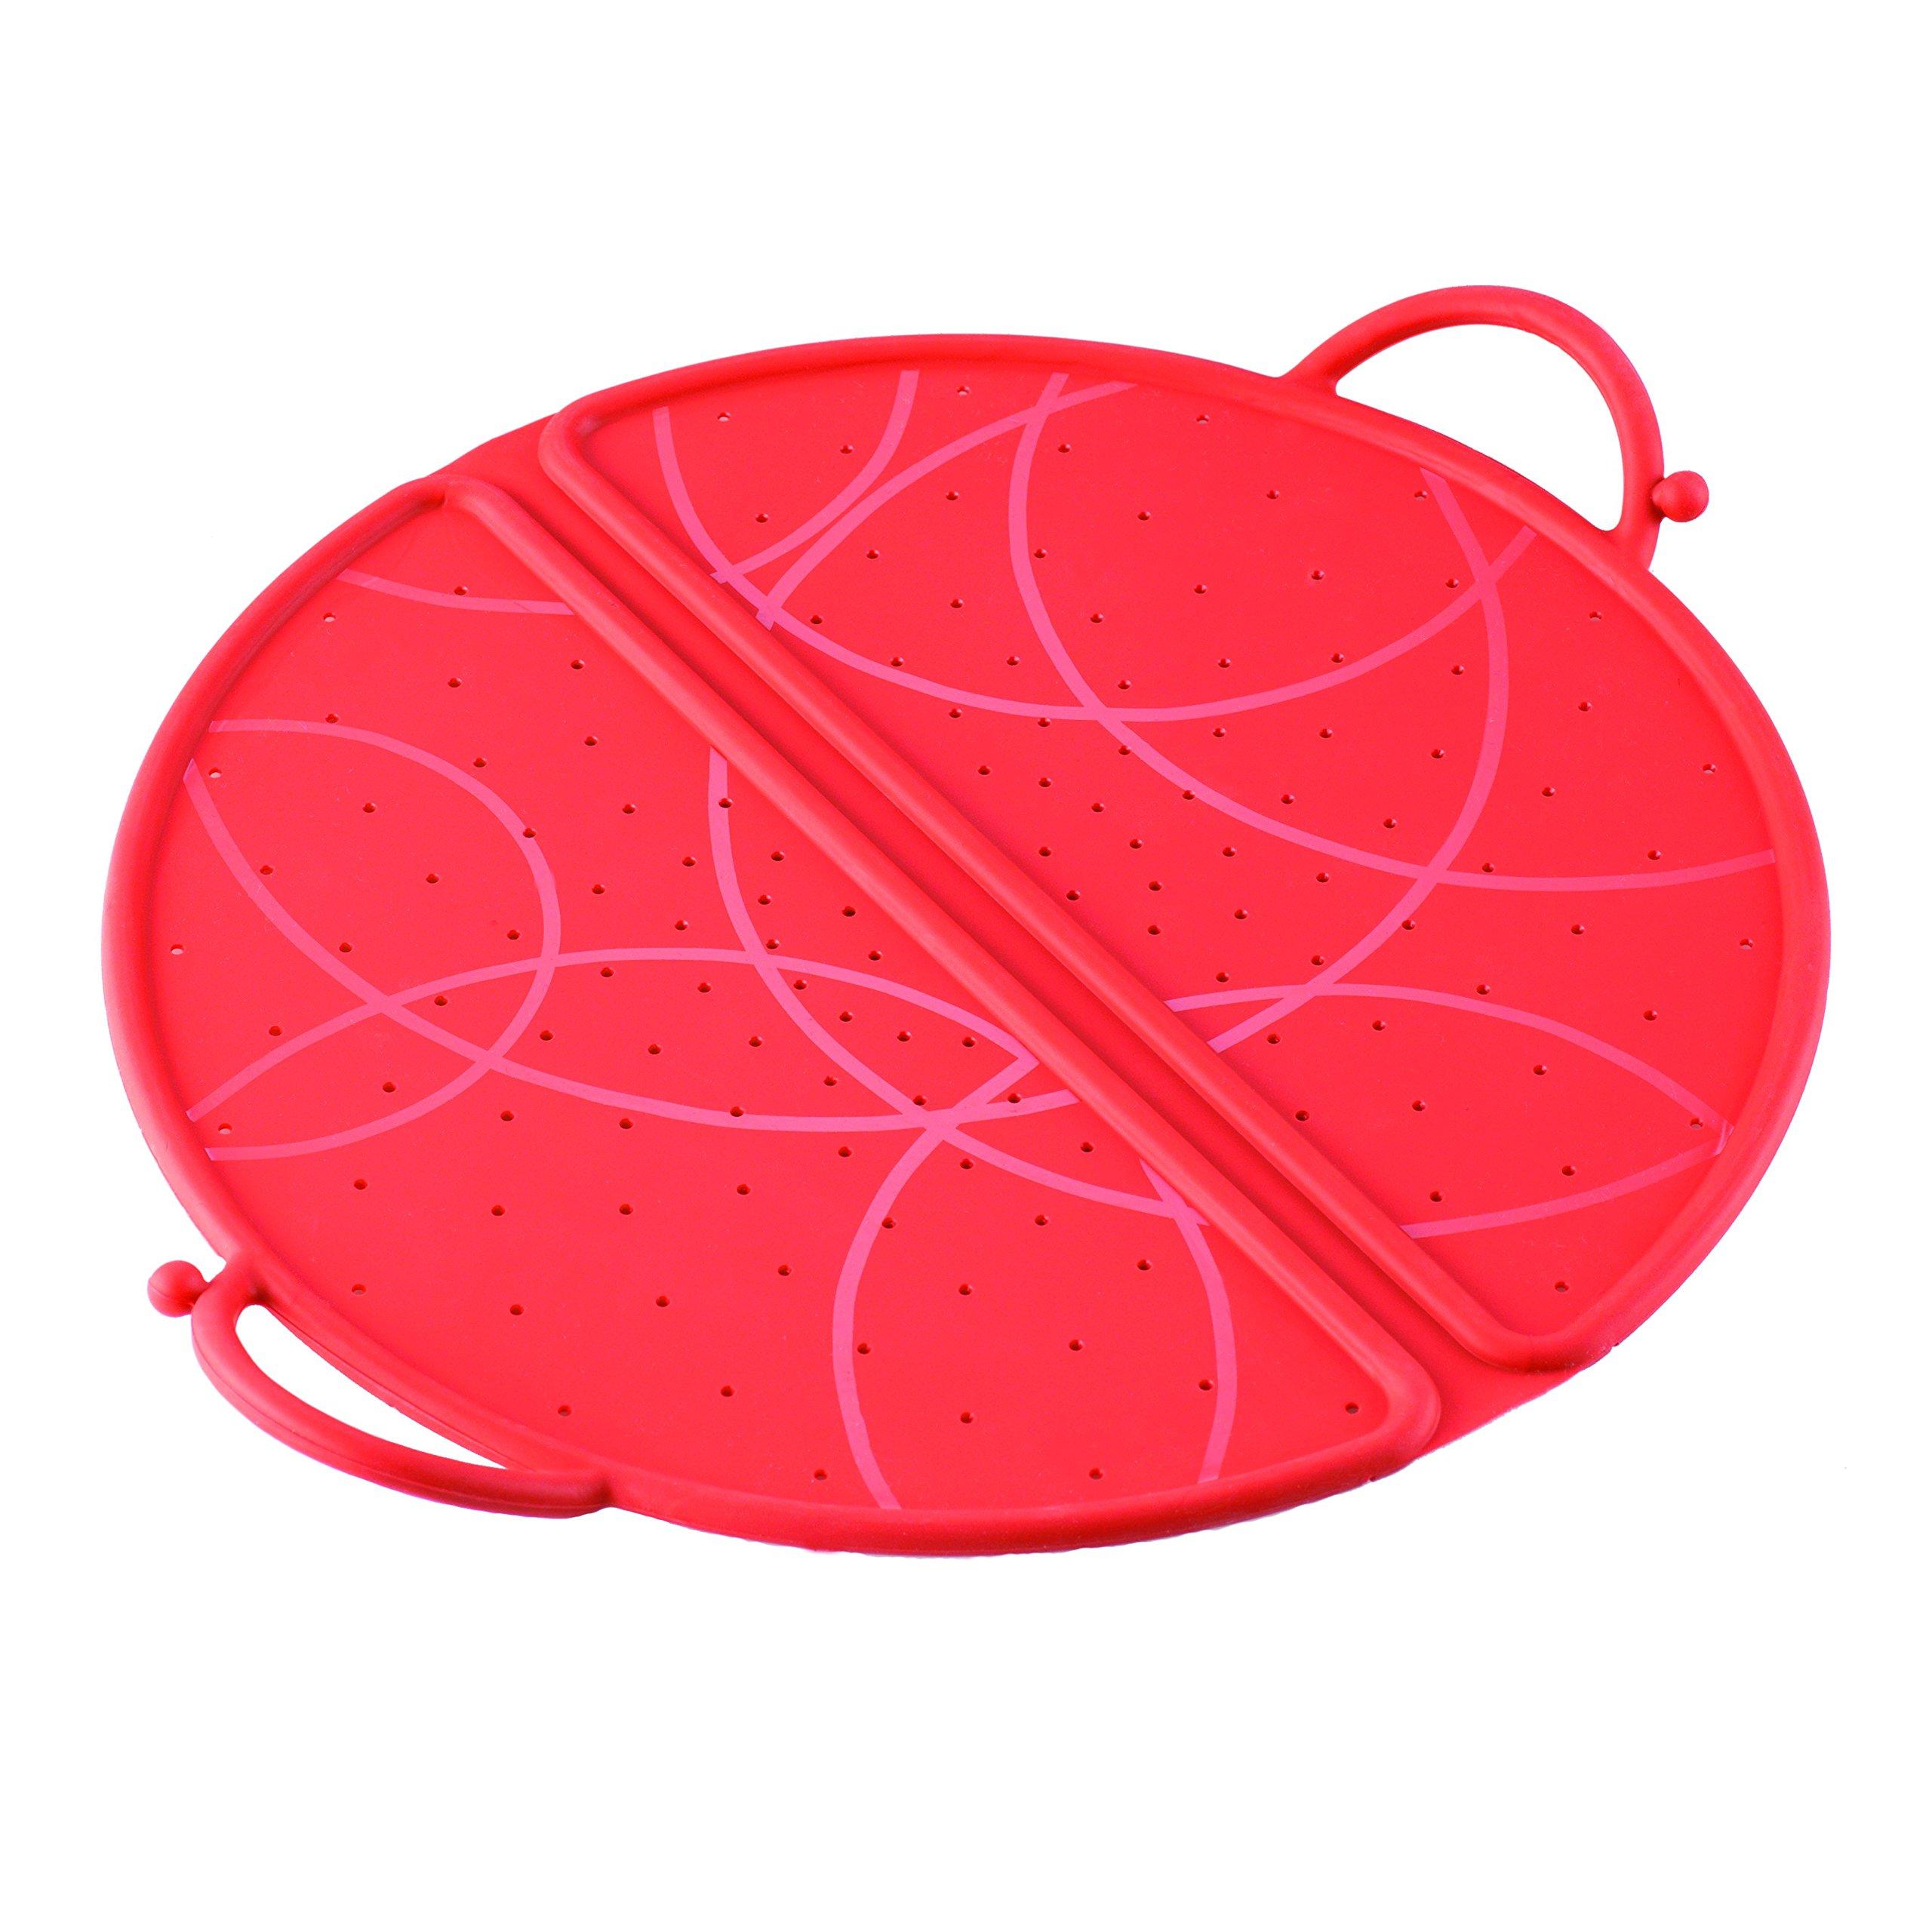 Kuhn Rikon Foldable Splatter Guard, 10-Inch, Red by Kuhn Rikon